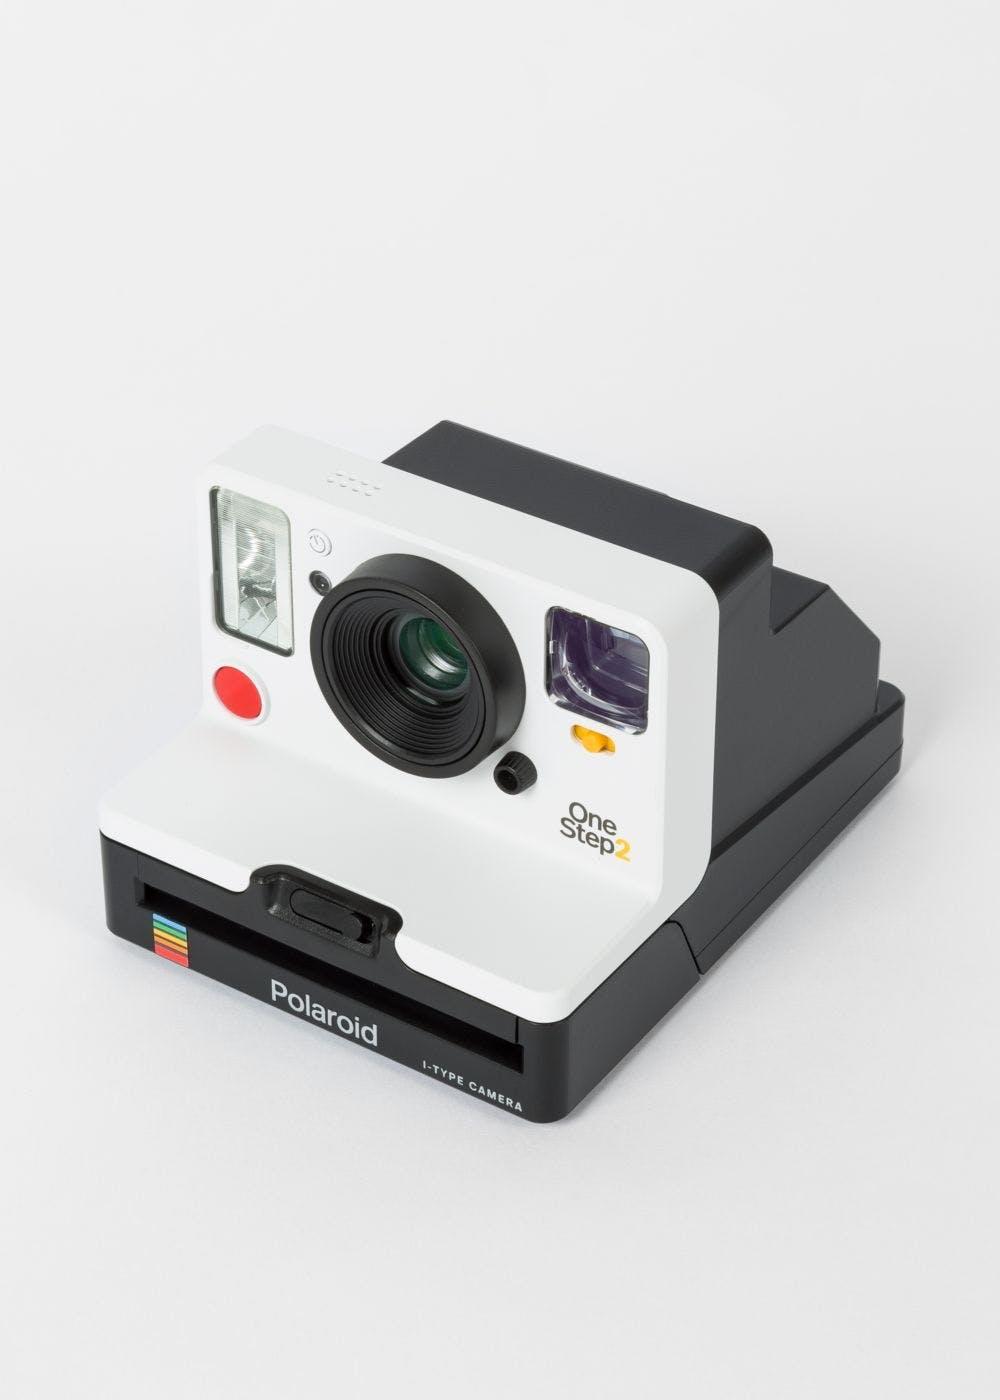 Polaroid kamera -gaveidé